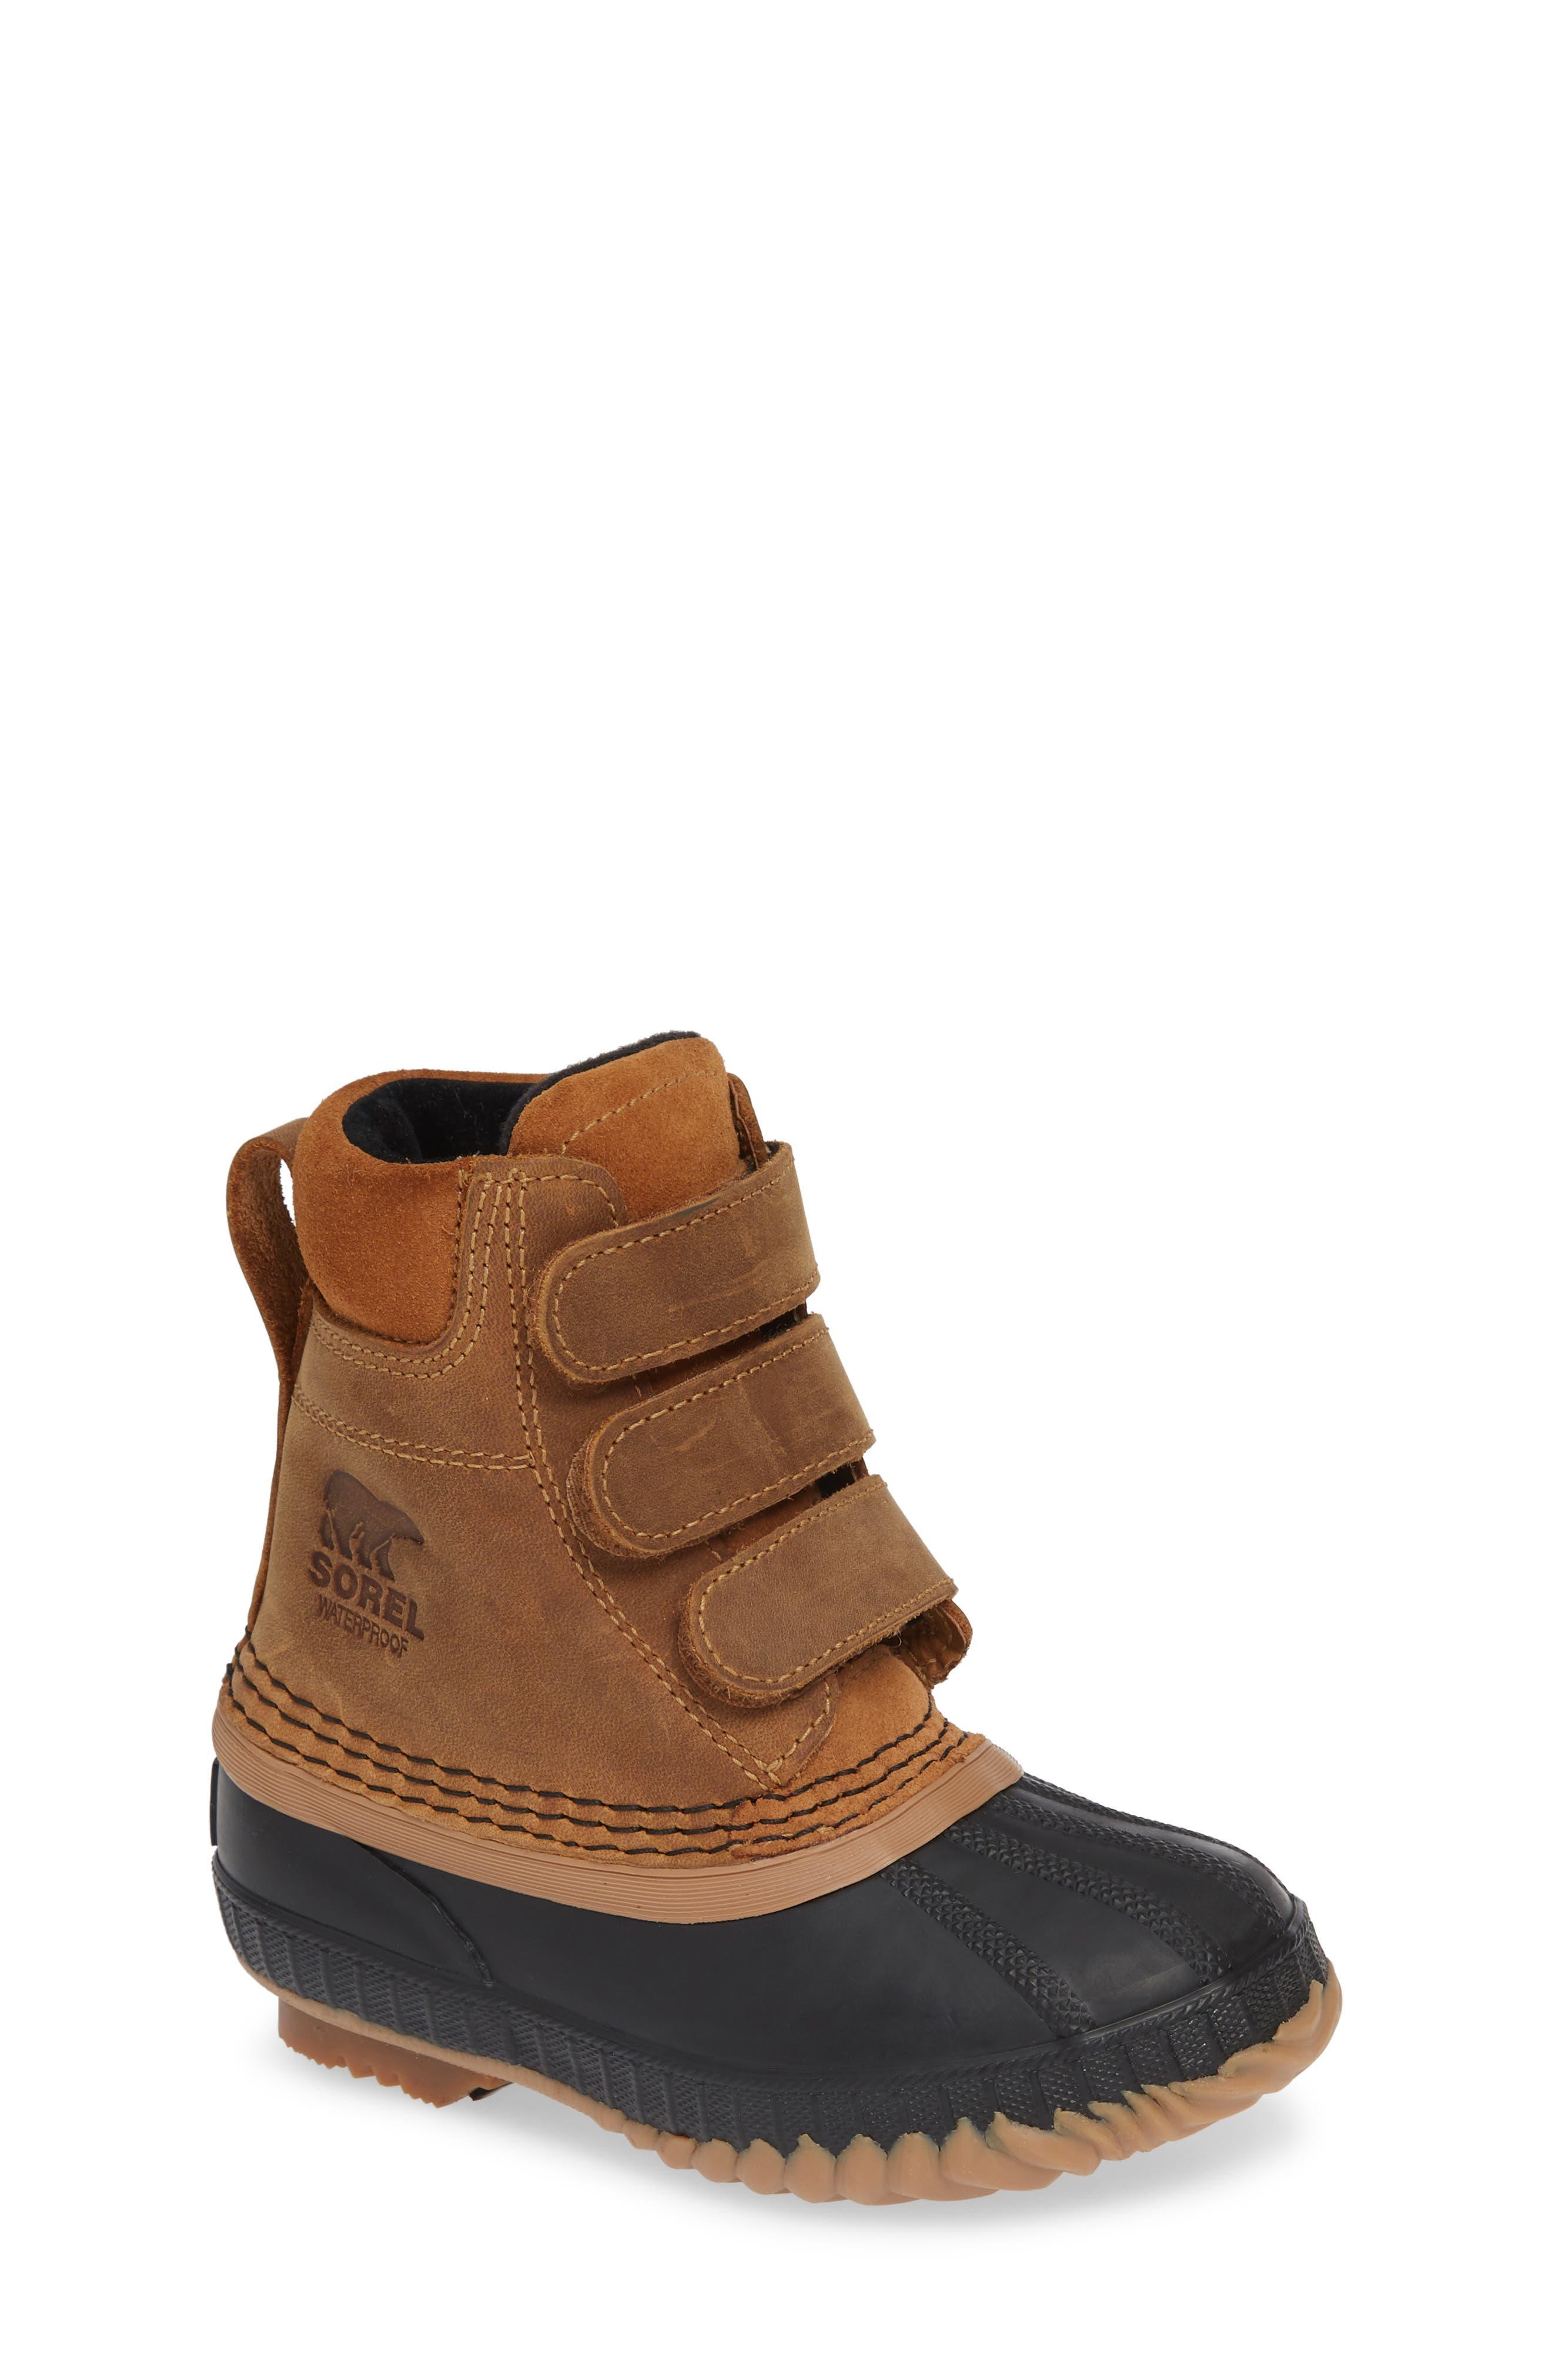 SOREL Cheyanne™ II Waterproof Boot